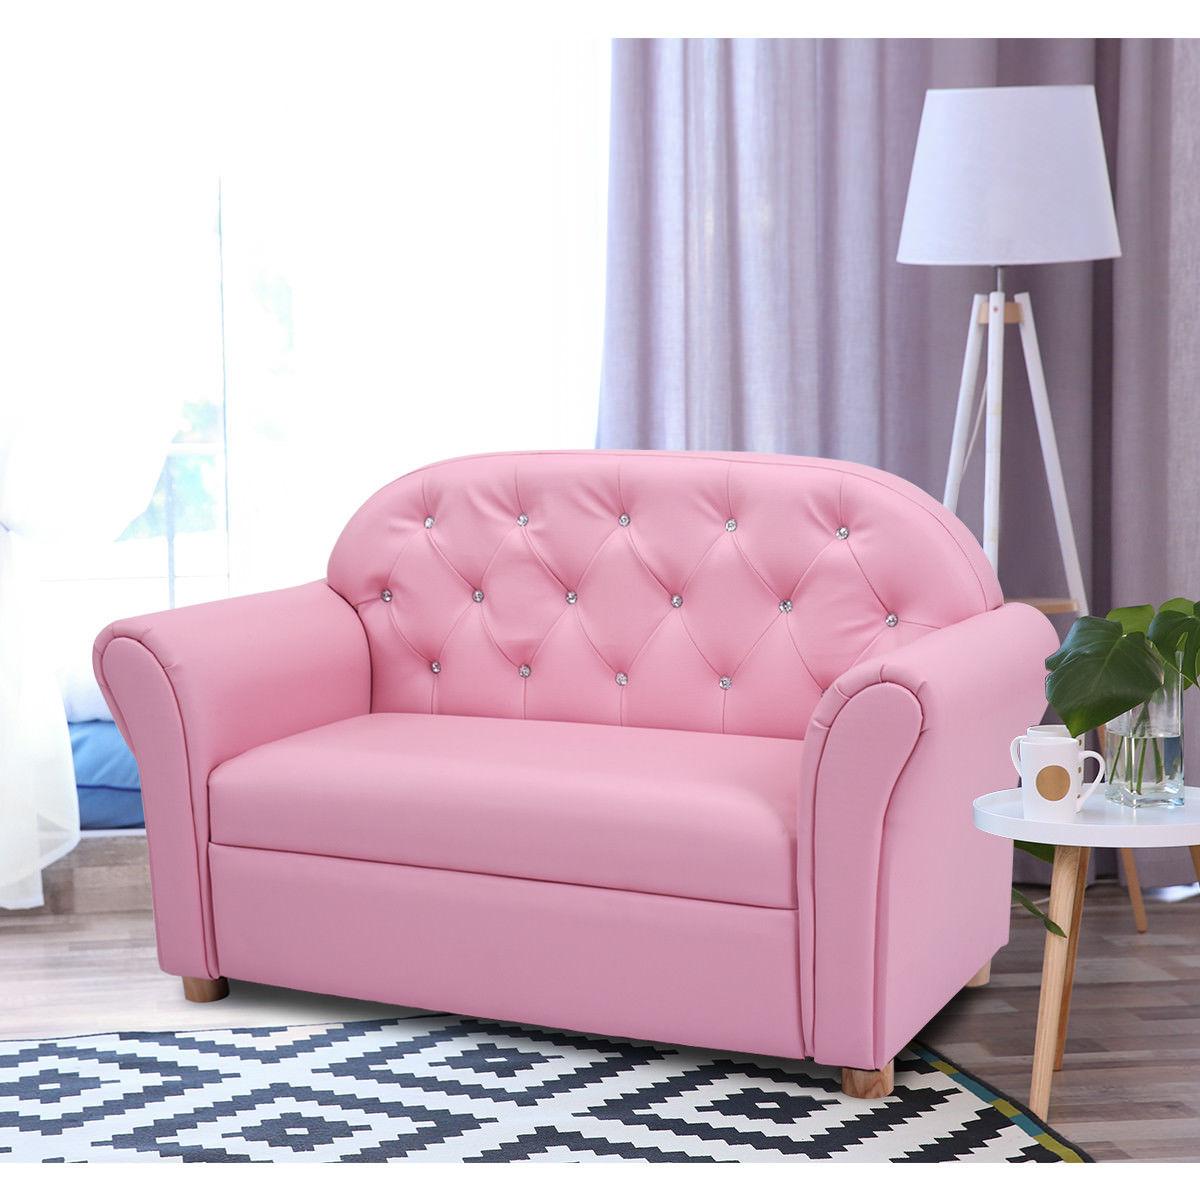 Costway Kids Sofa Princess Armrest Chair Lounge Couch Children